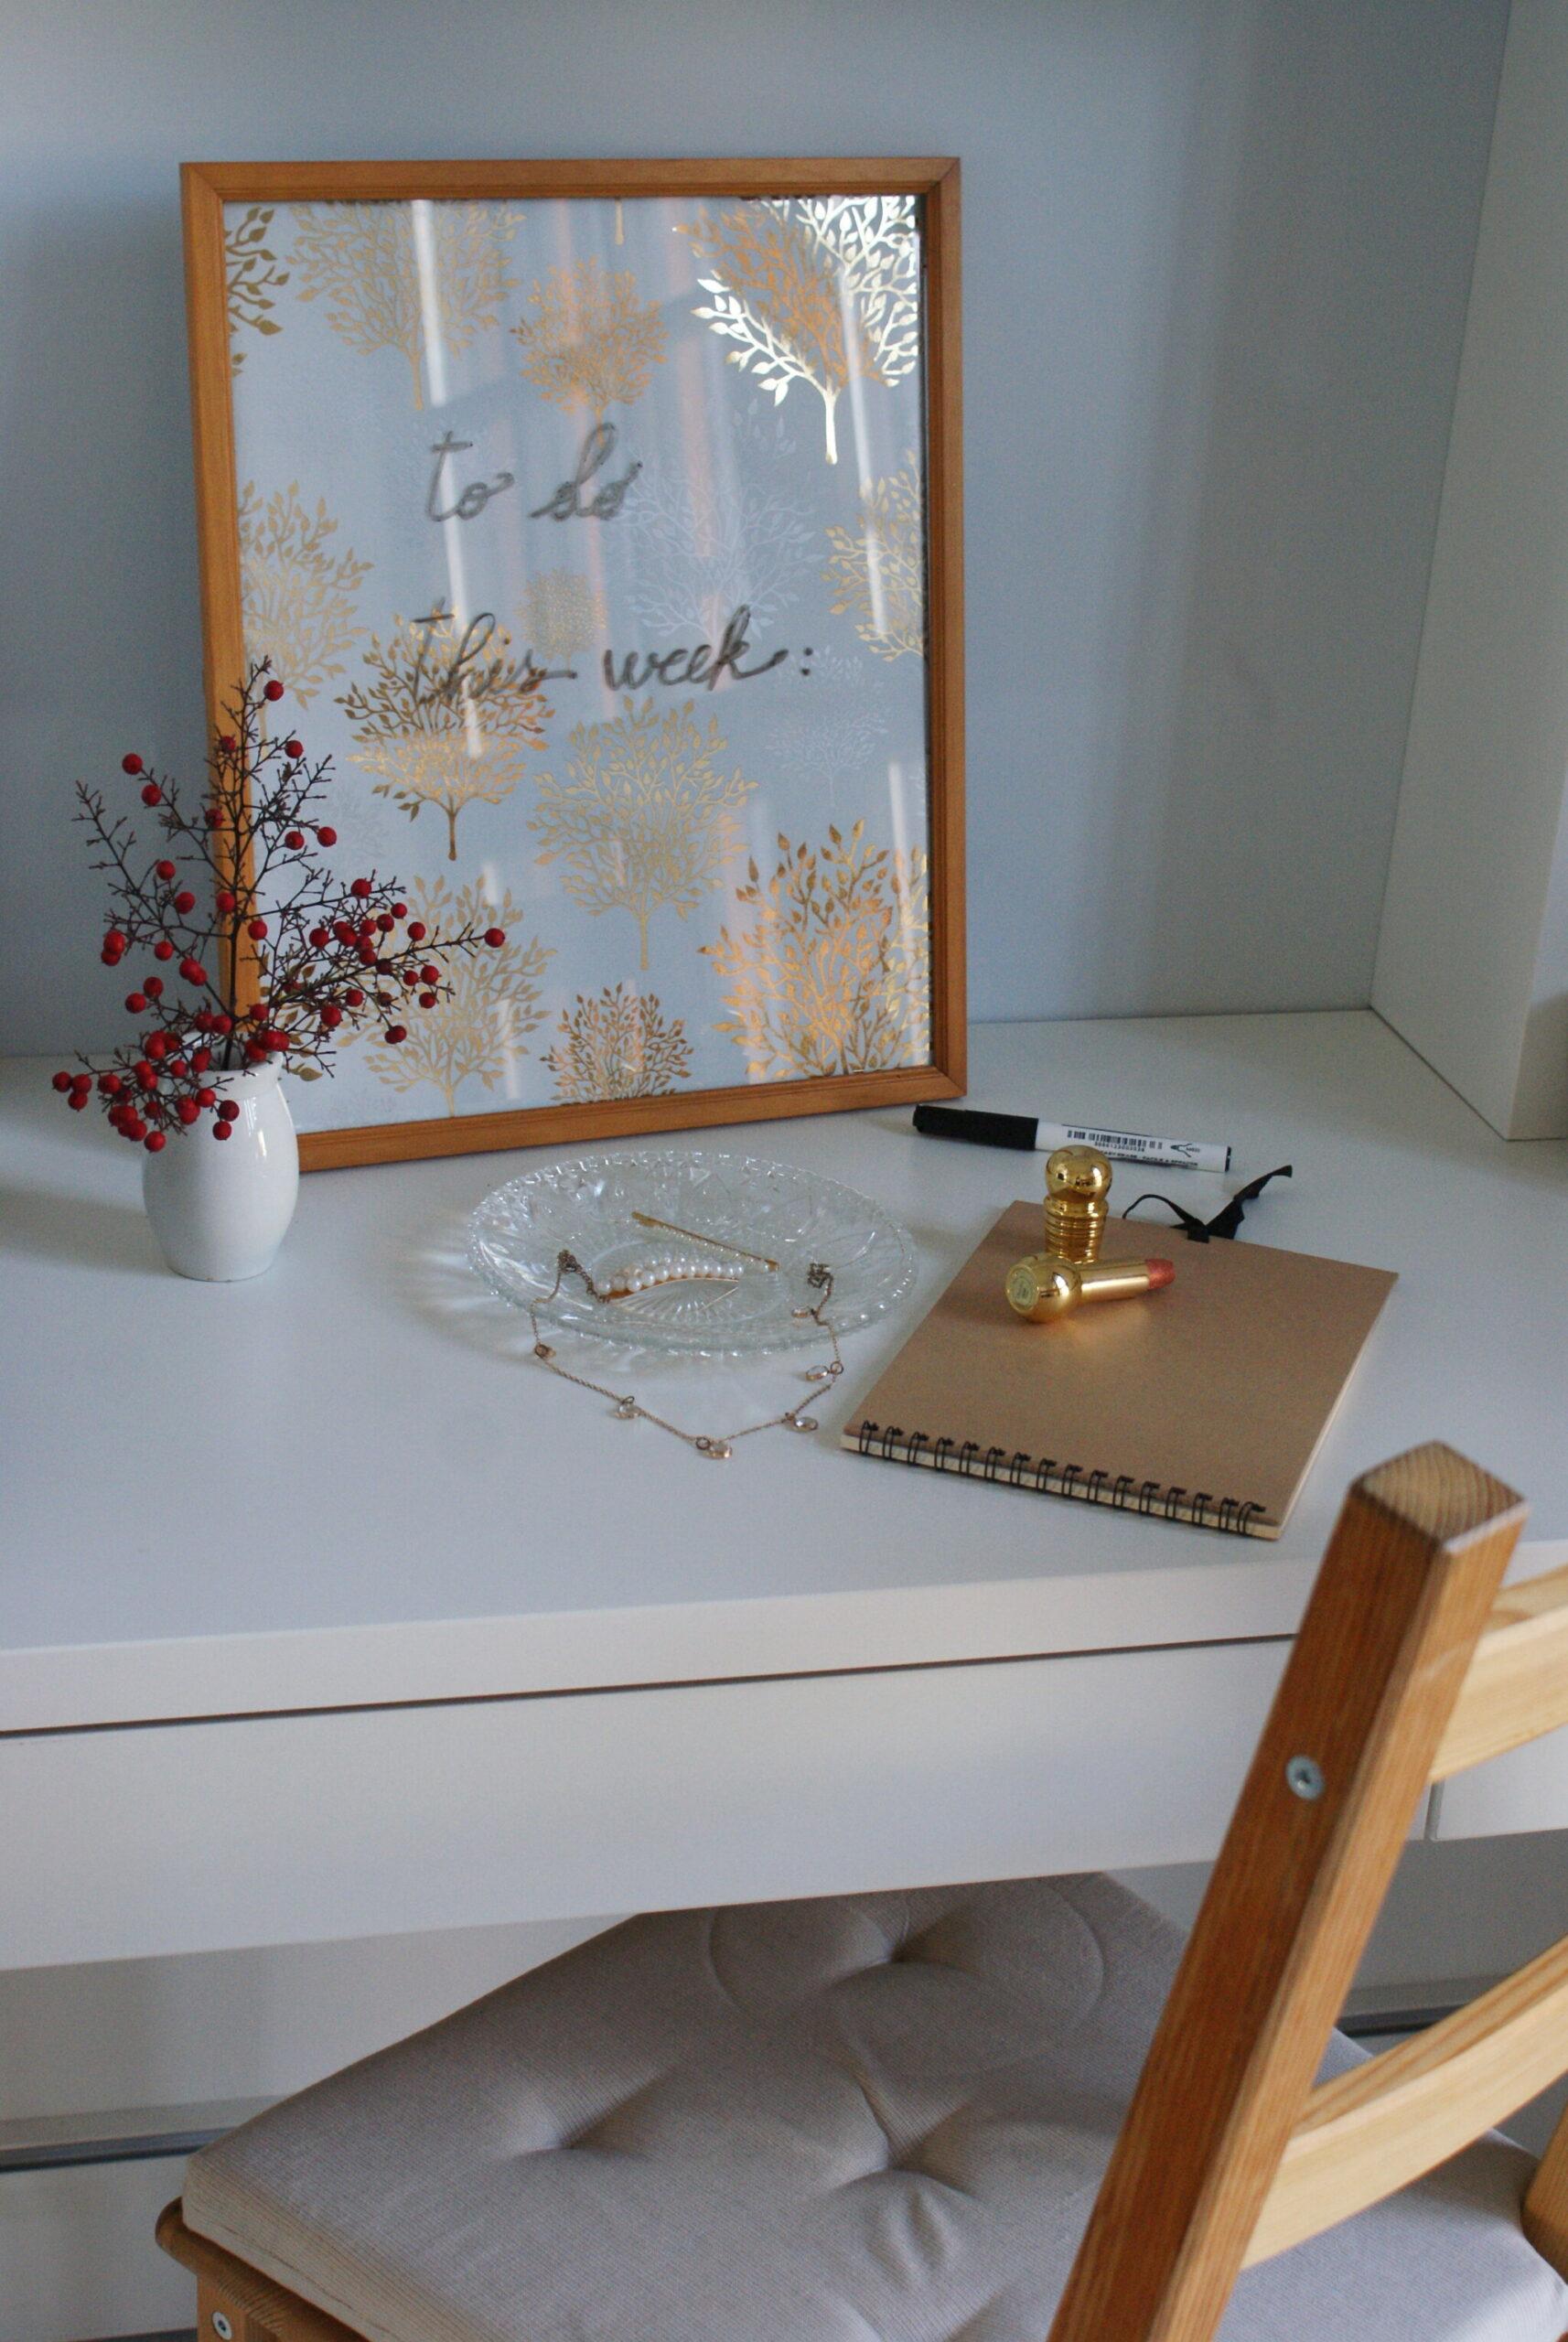 diy dry erase board 5 minute cheap tutorial handmade how make minimalist